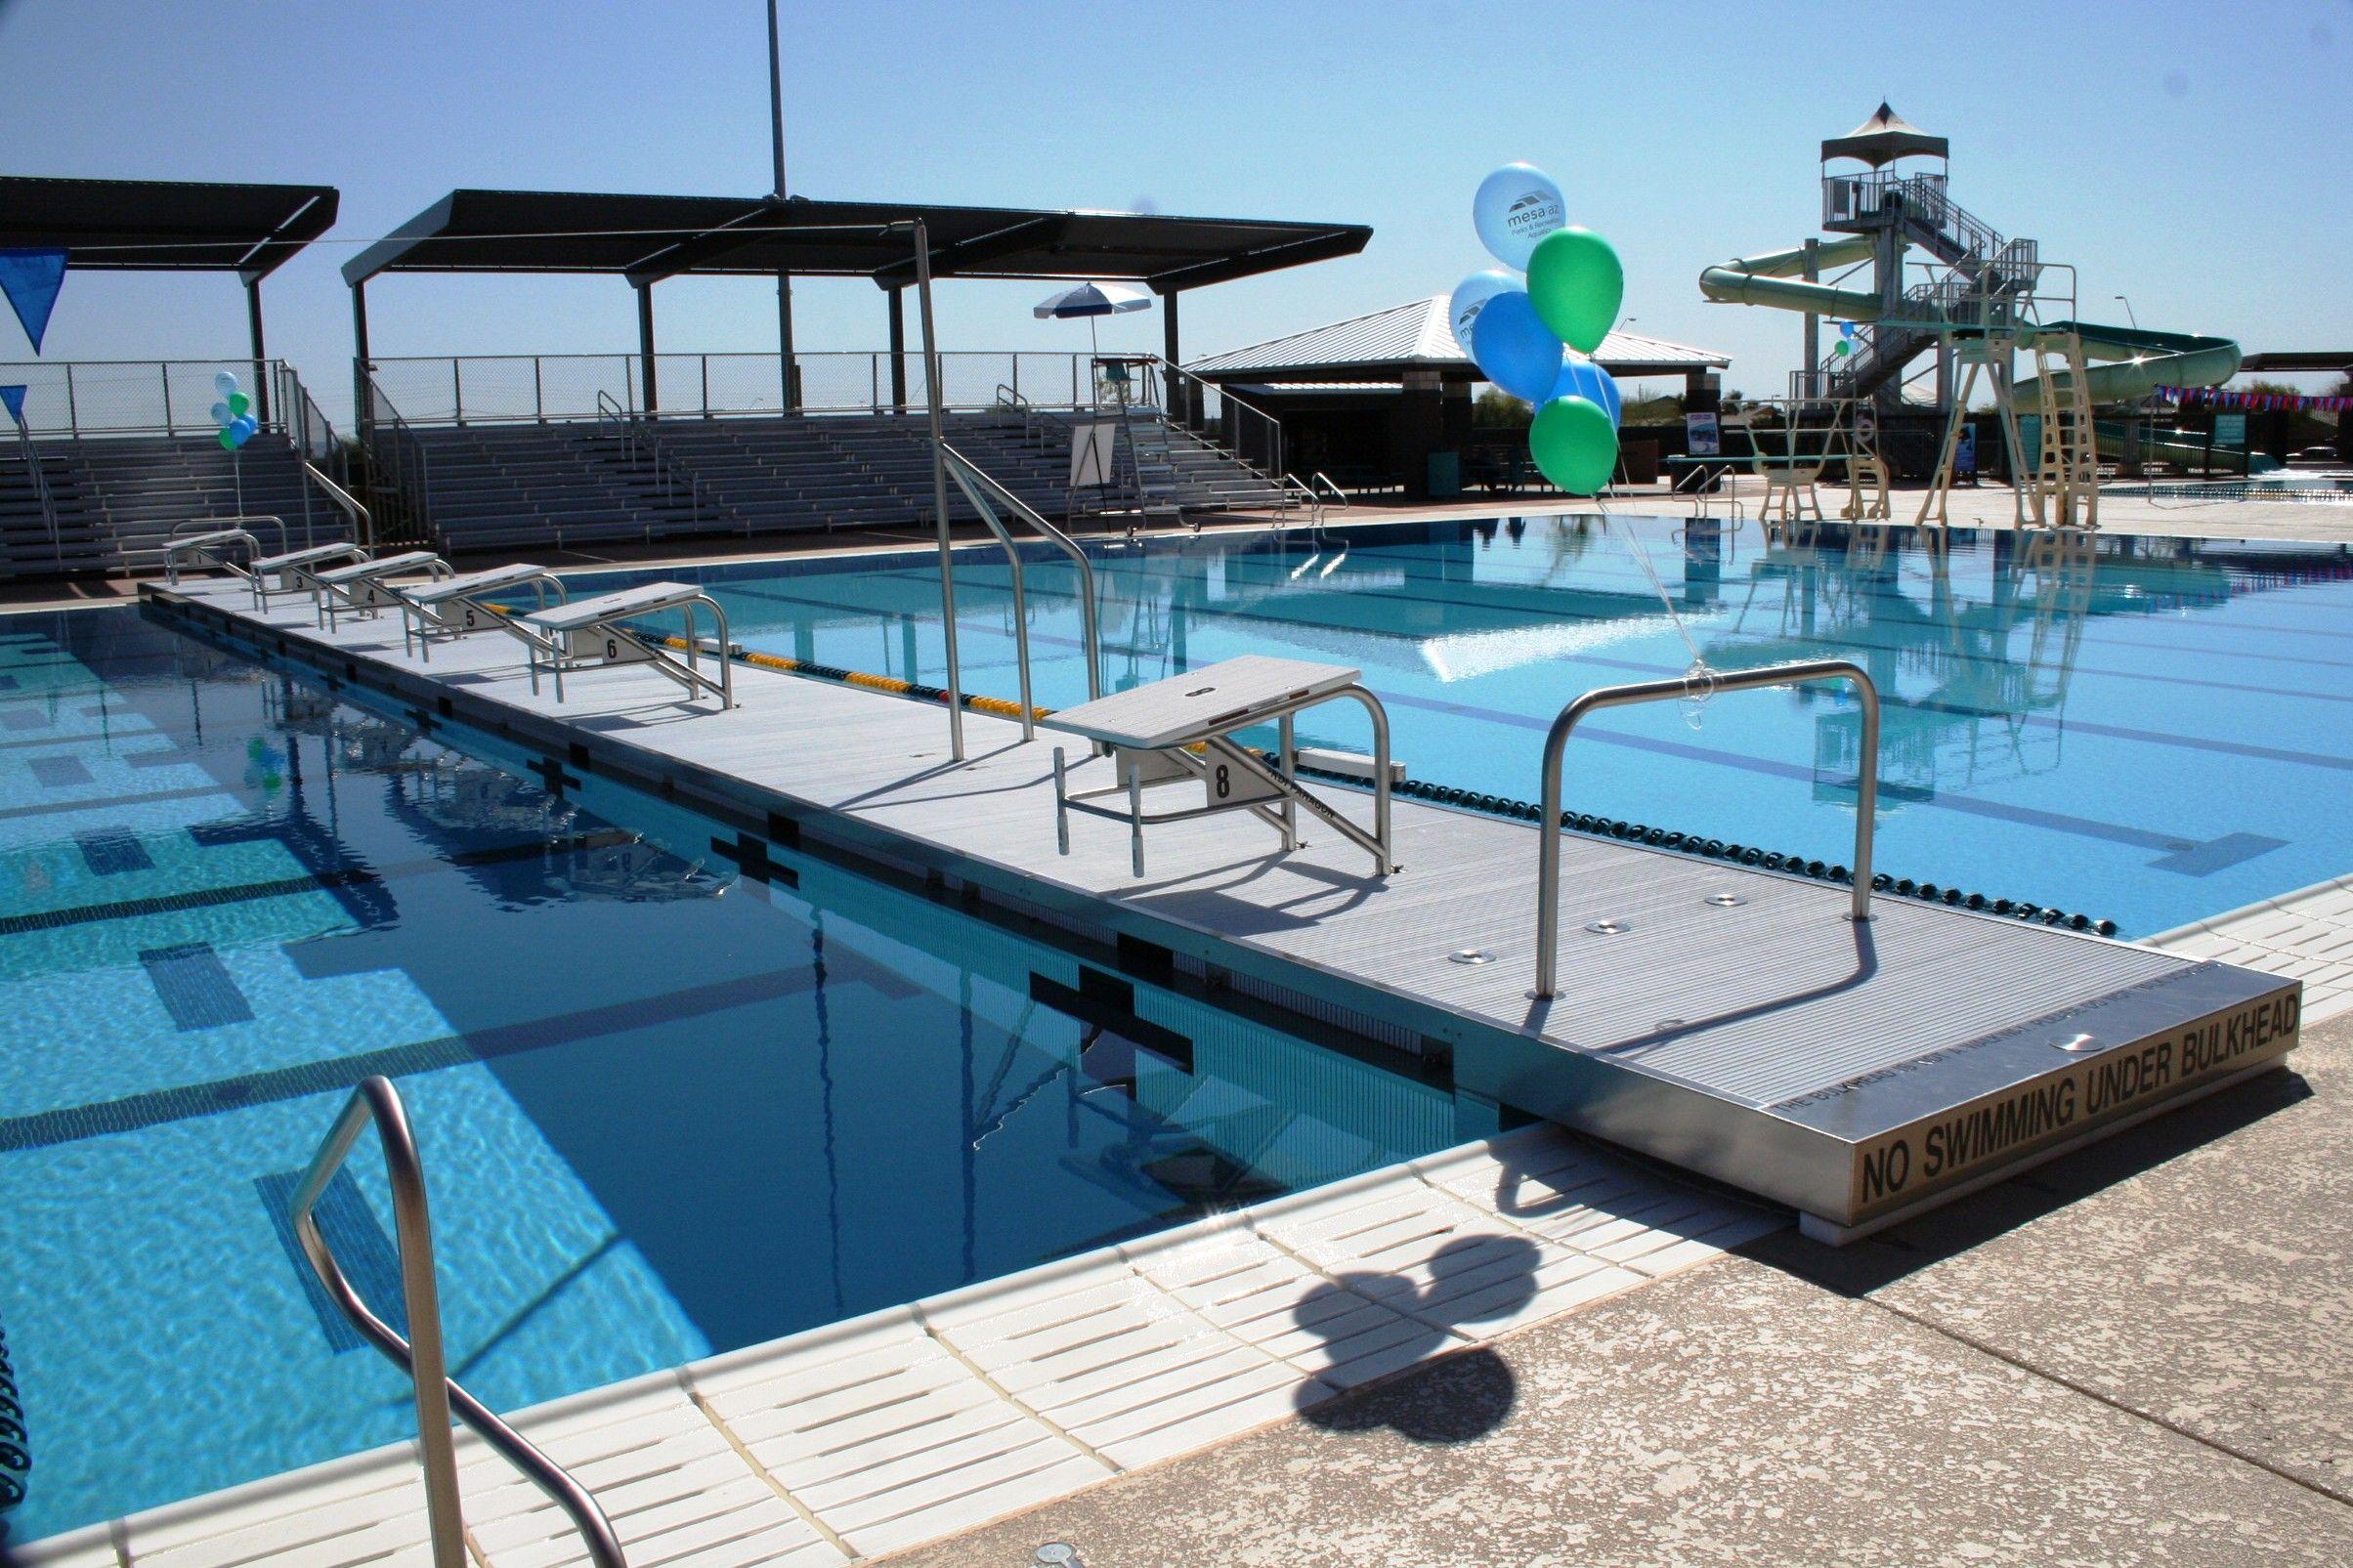 Desert Breeze Aquatic Facility $3Adult, Kids Under 3 Free -